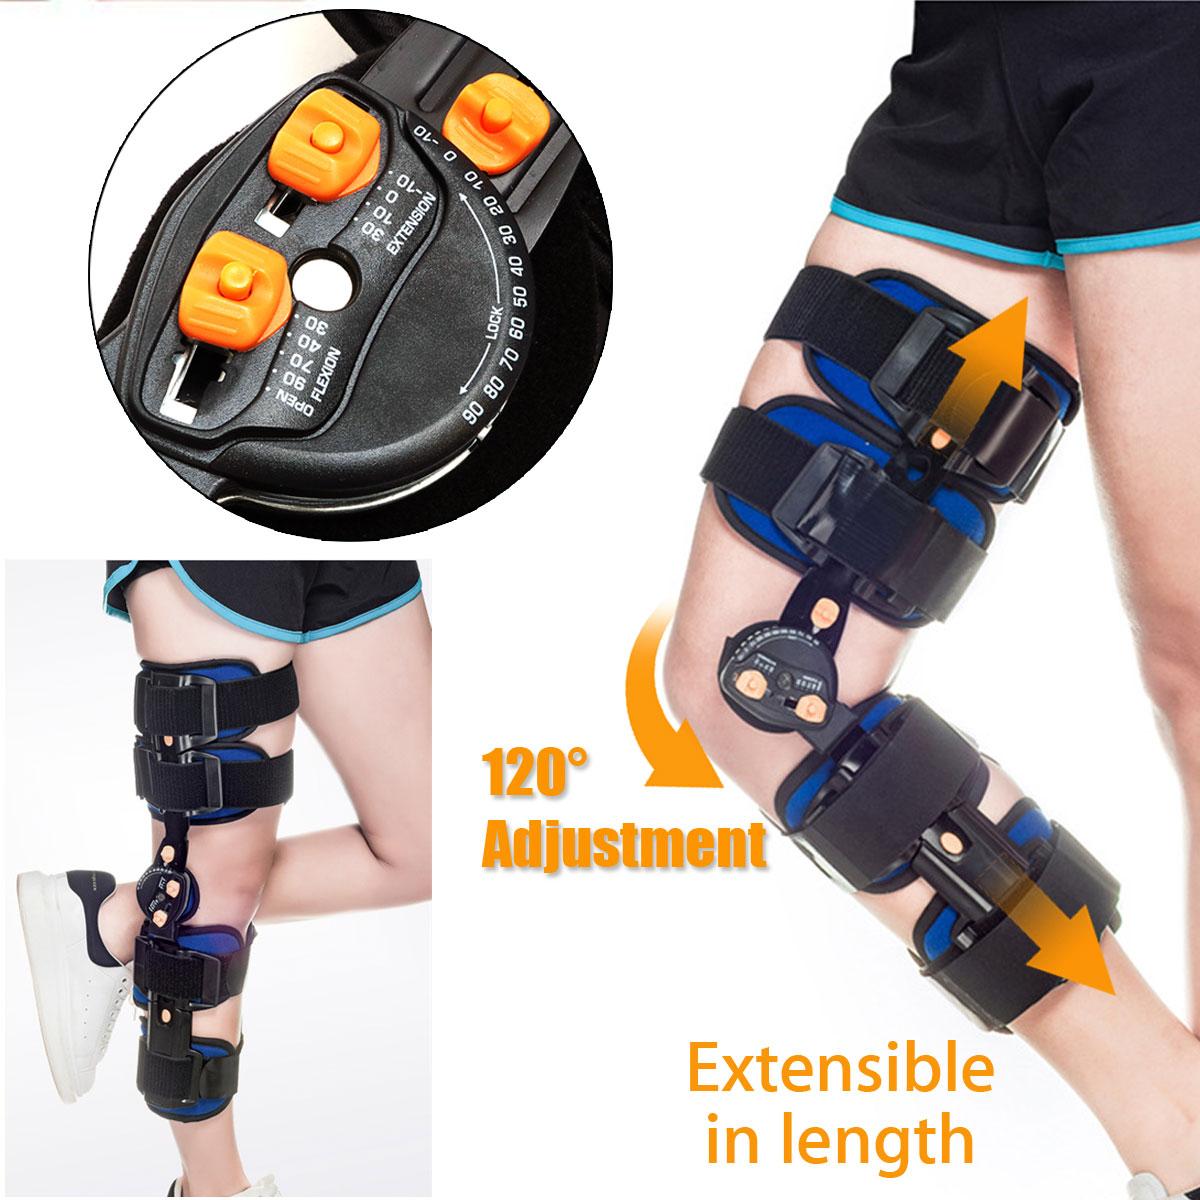 KIFIT Professional T-Scope ROM Post Op Knee Brace Adjustable Hinged Leg Universal Size Braces & Supports